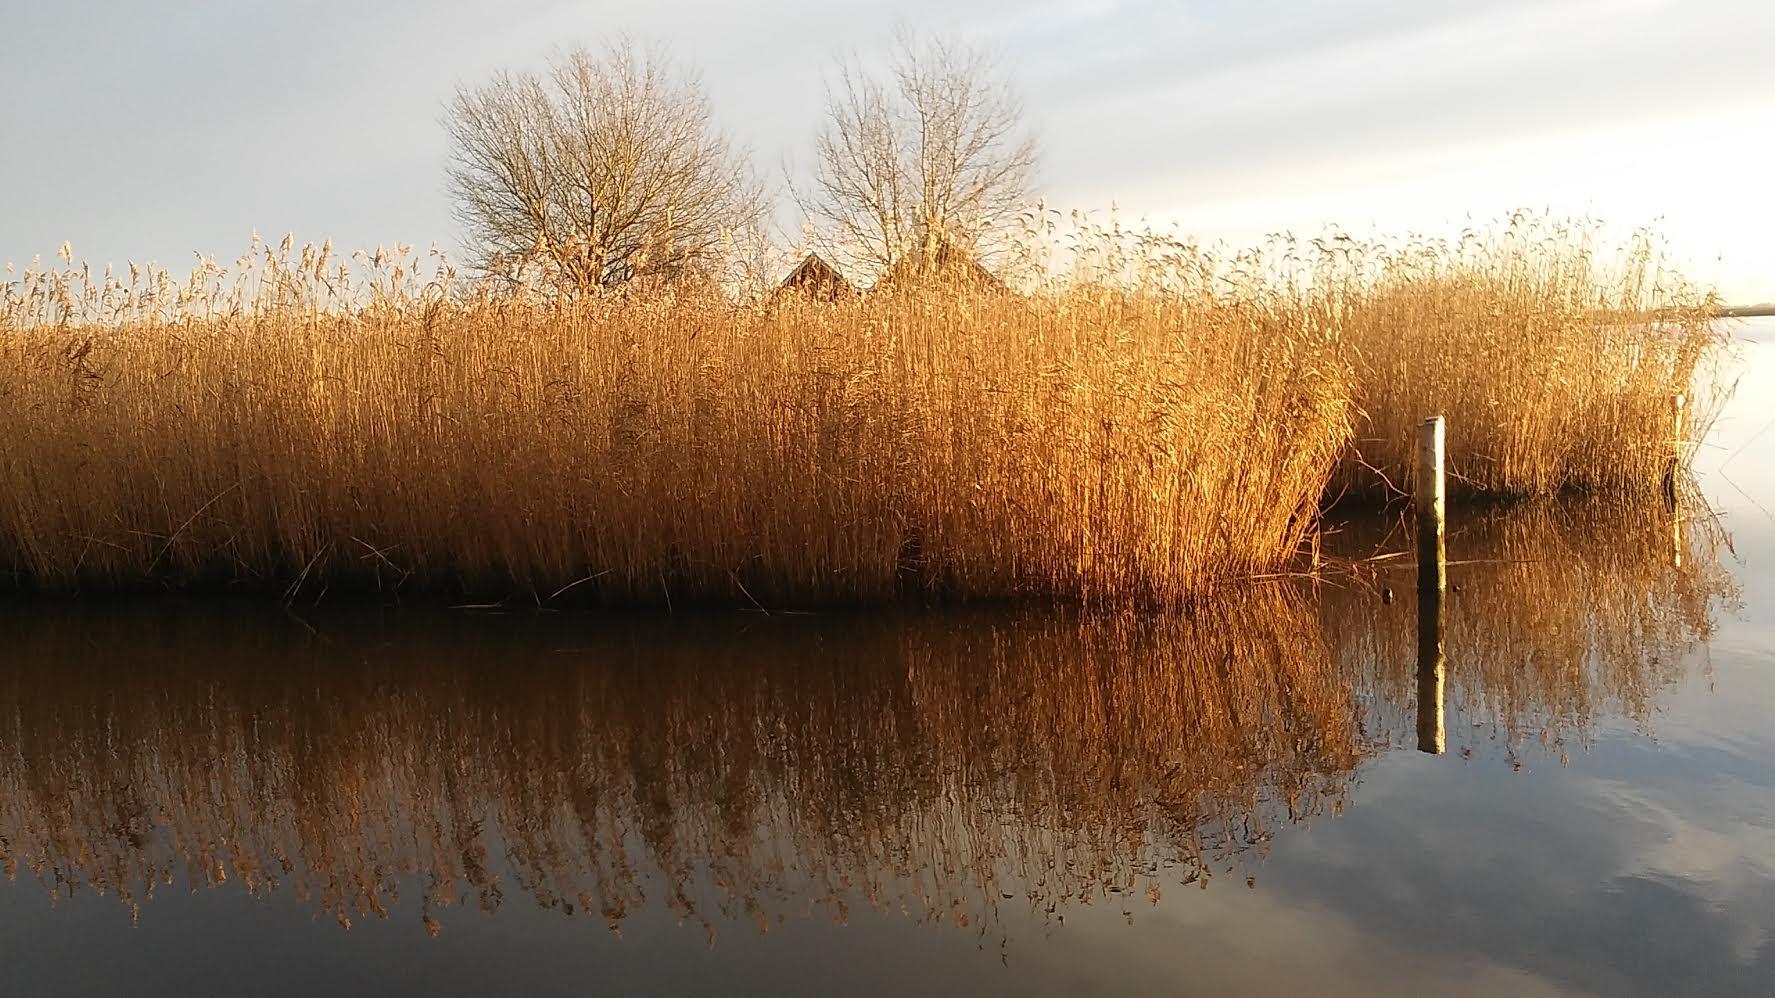 Proceskonsulent for 13 landsbyer i Kronjylland